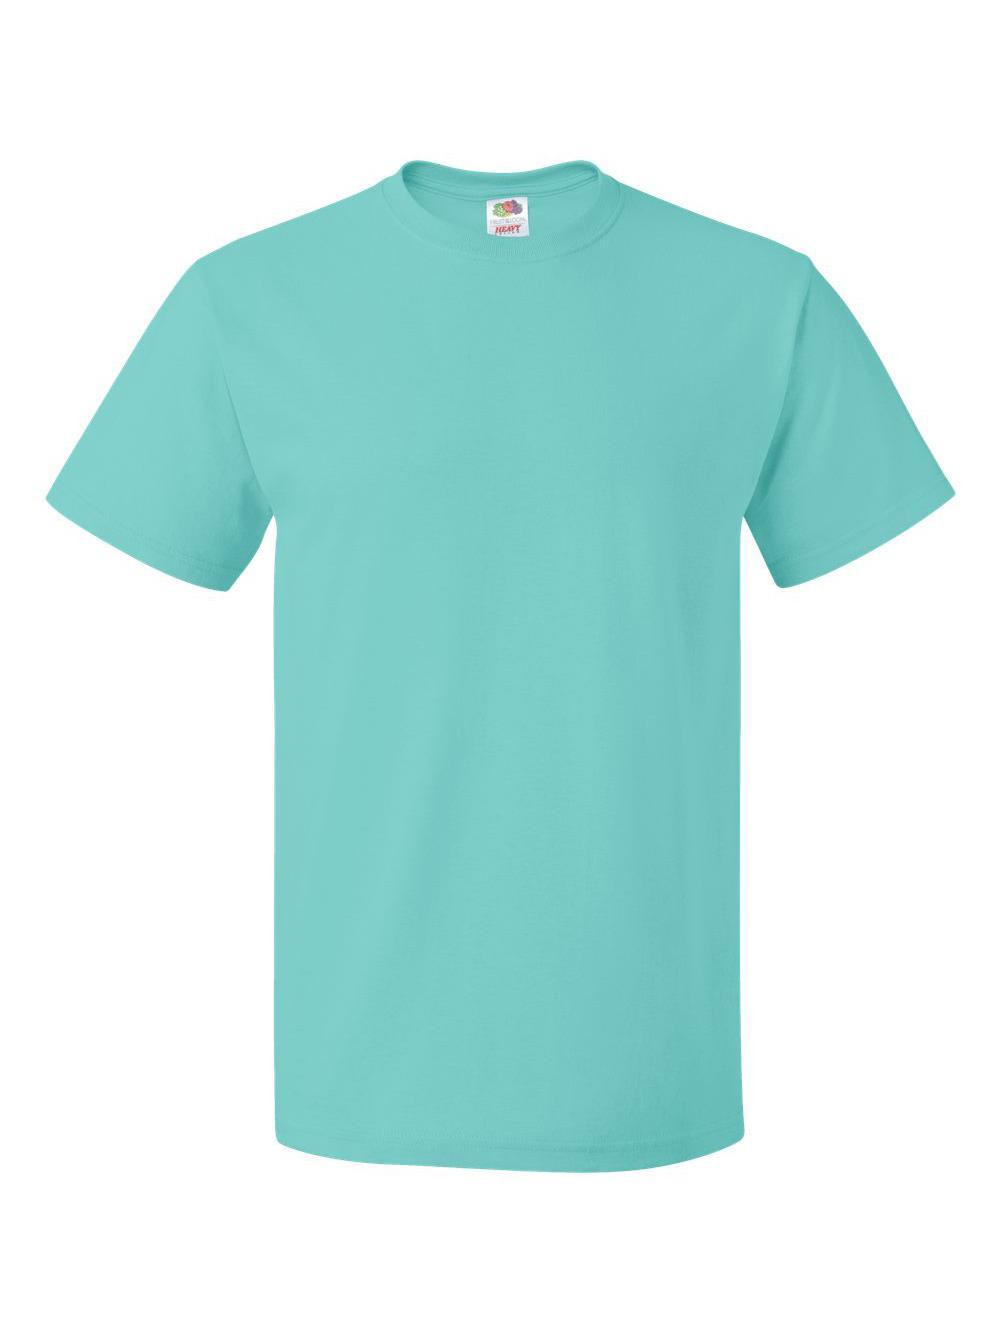 Fruit-of-the-Loom-HD-Cotton-Short-Sleeve-T-Shirt-3930R thumbnail 123